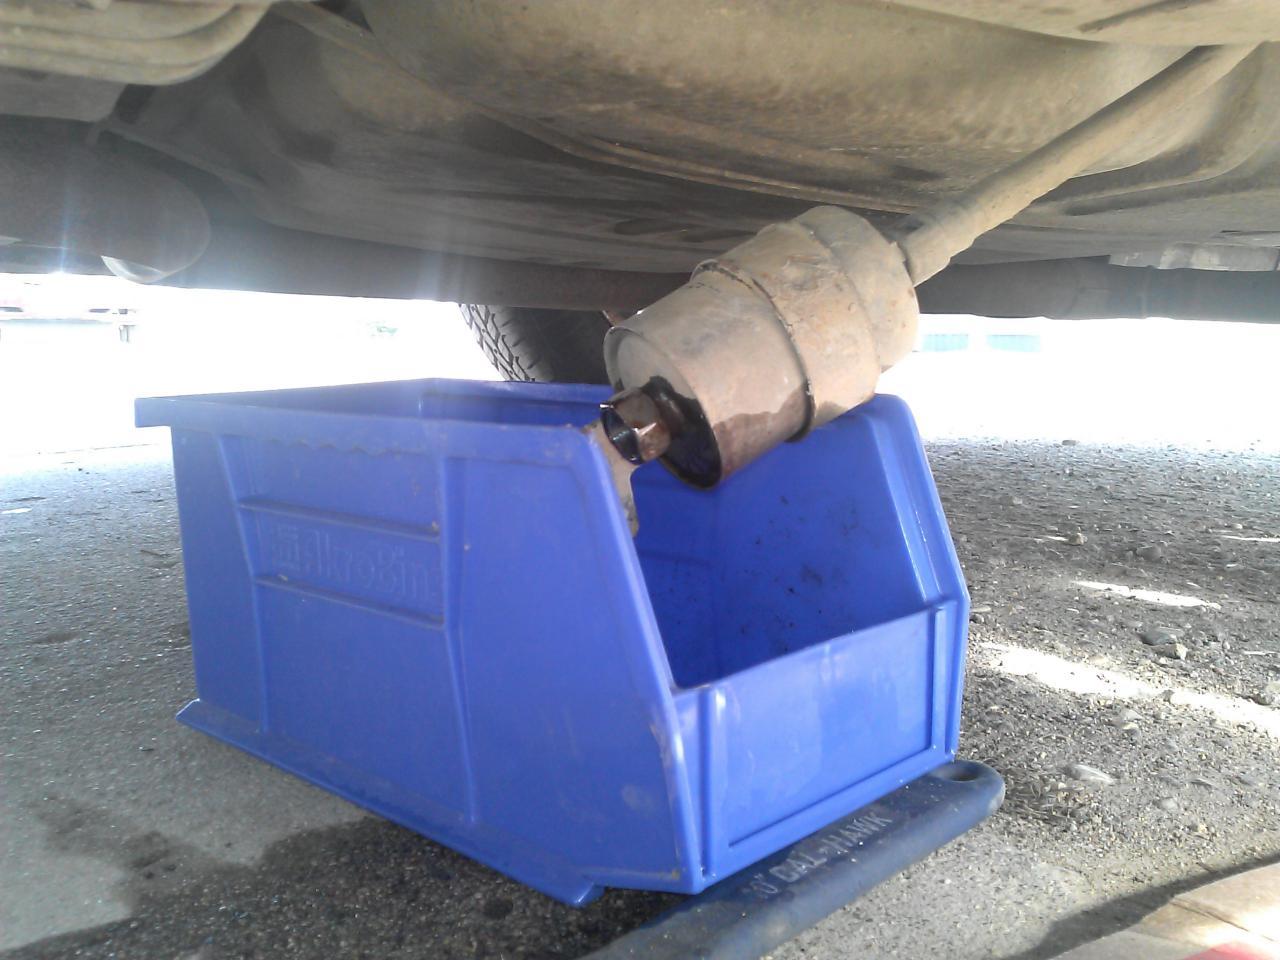 1997 2003 Pontiac Grand Prix Gt Fuel Filter Replacement Fiero Location